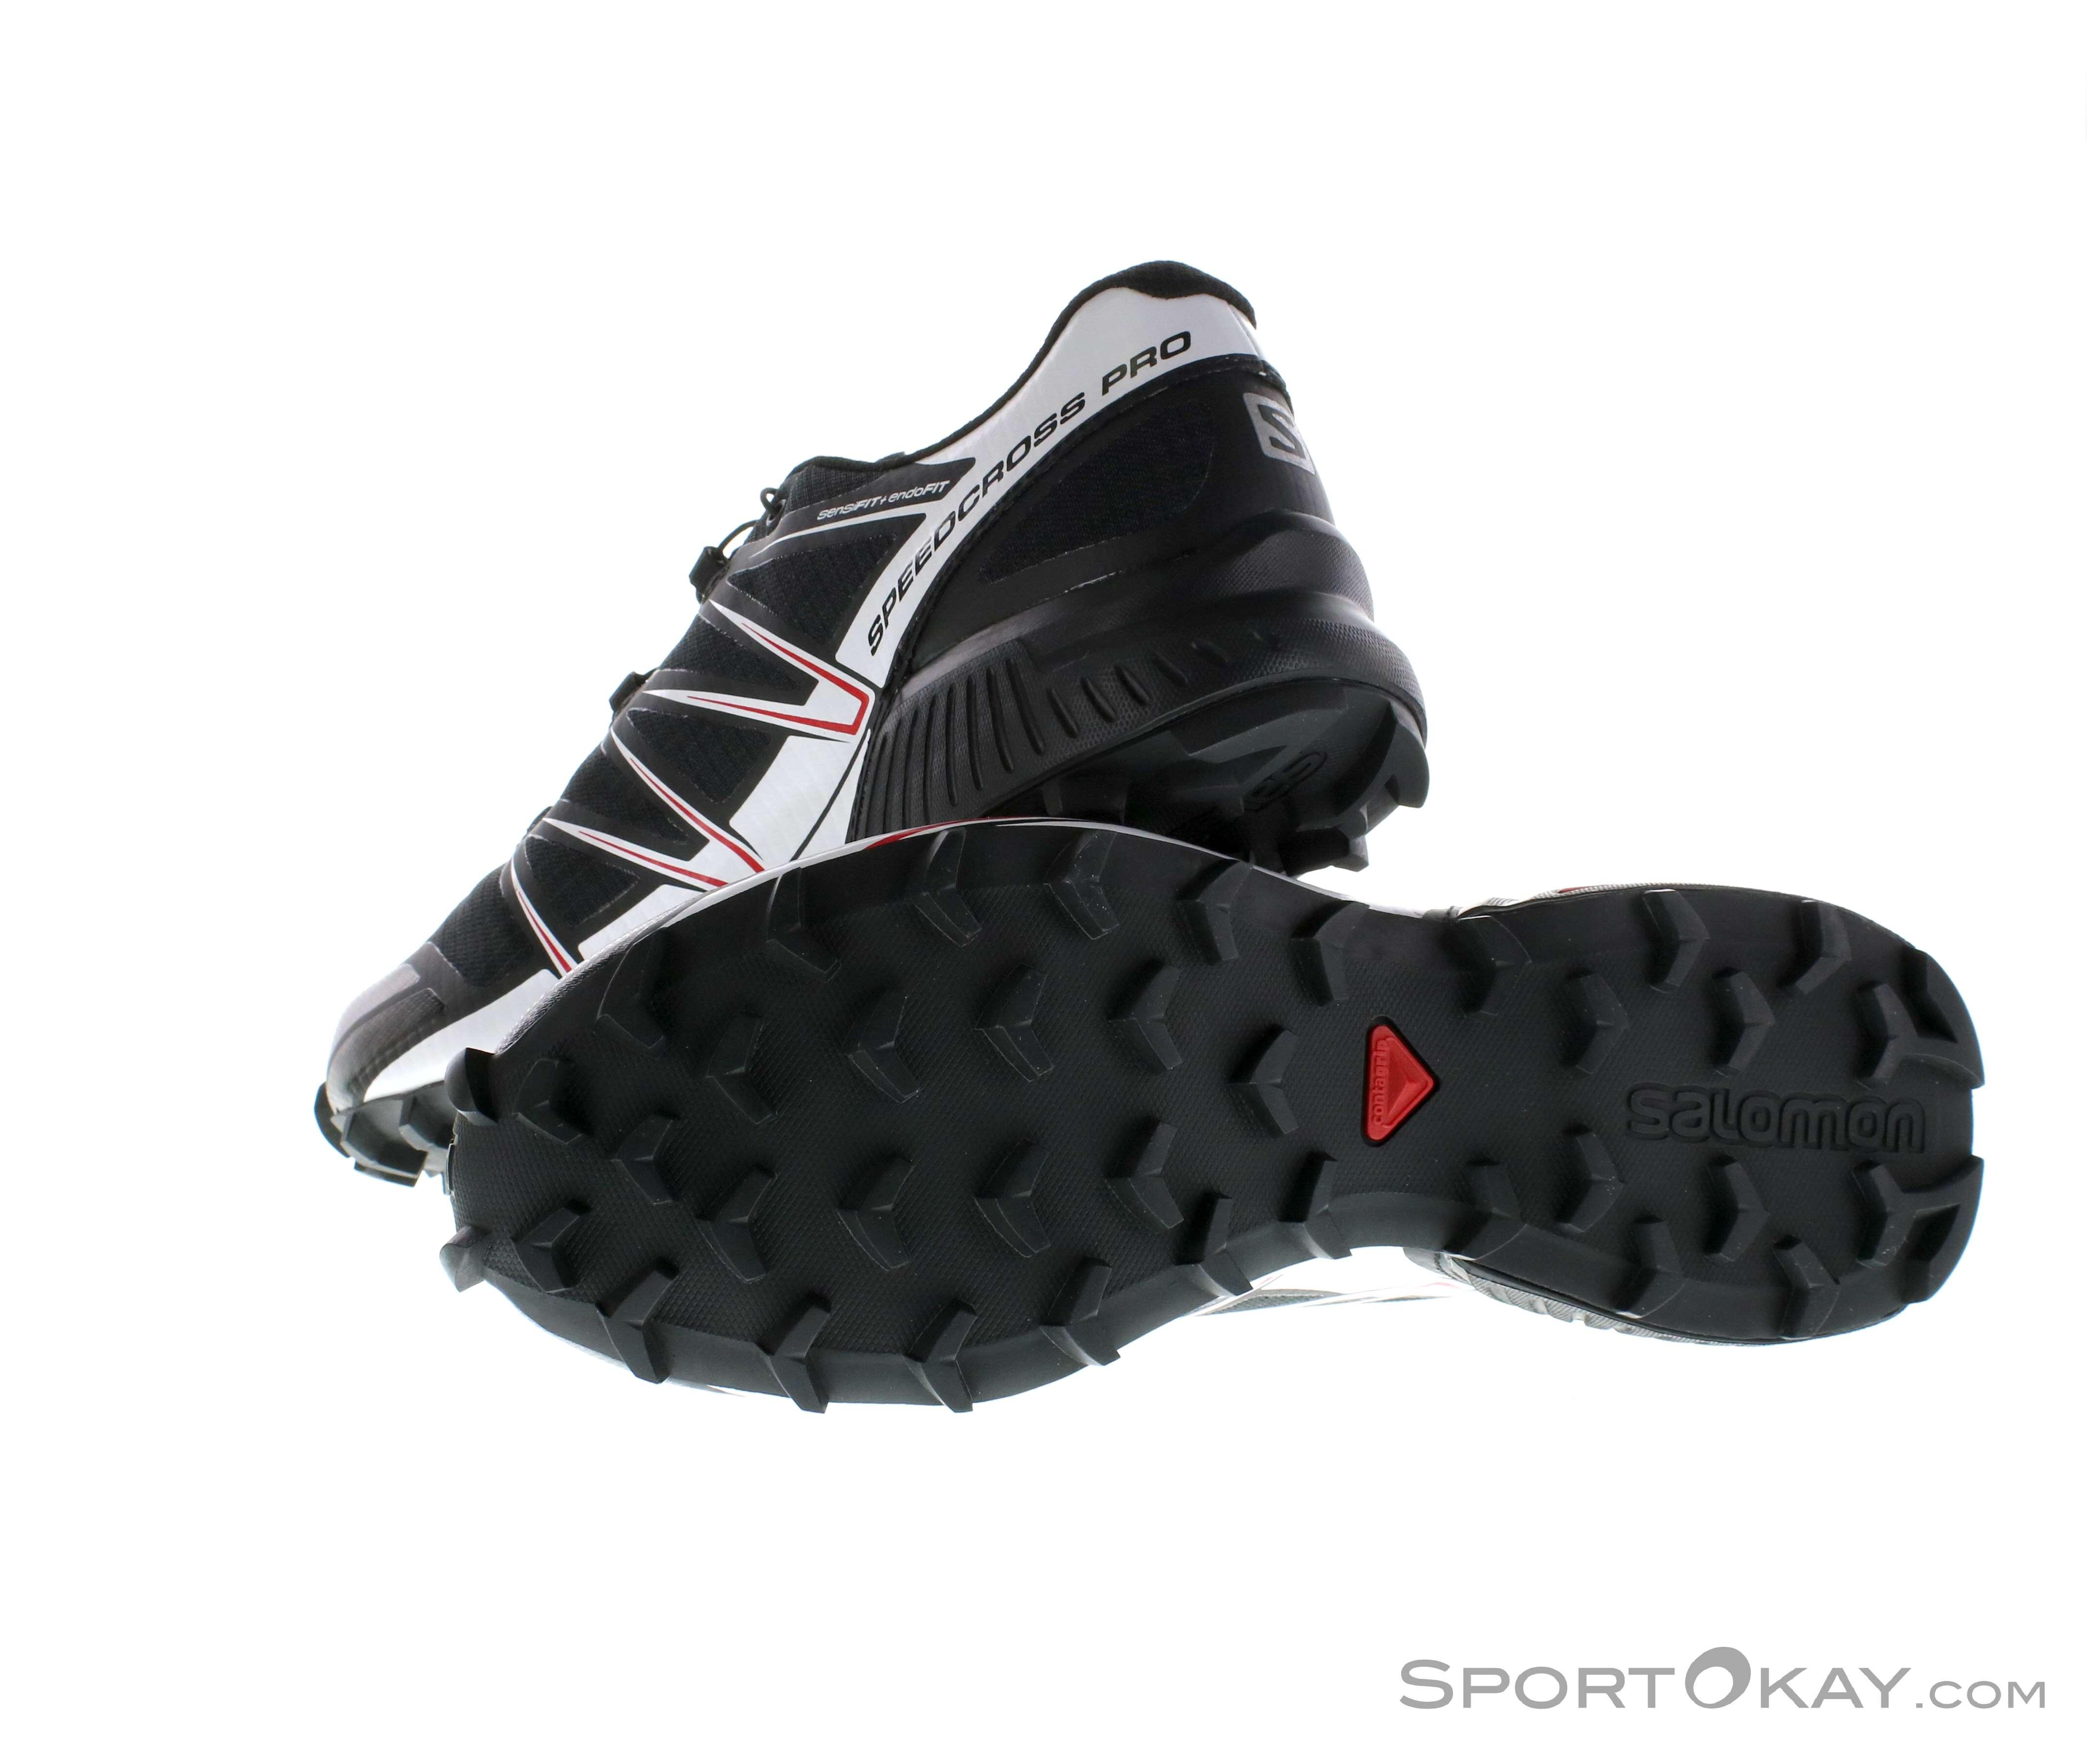 3 Salomon Pro Trail Running Uomo Da Scarpe Speedcross MpUVzqS